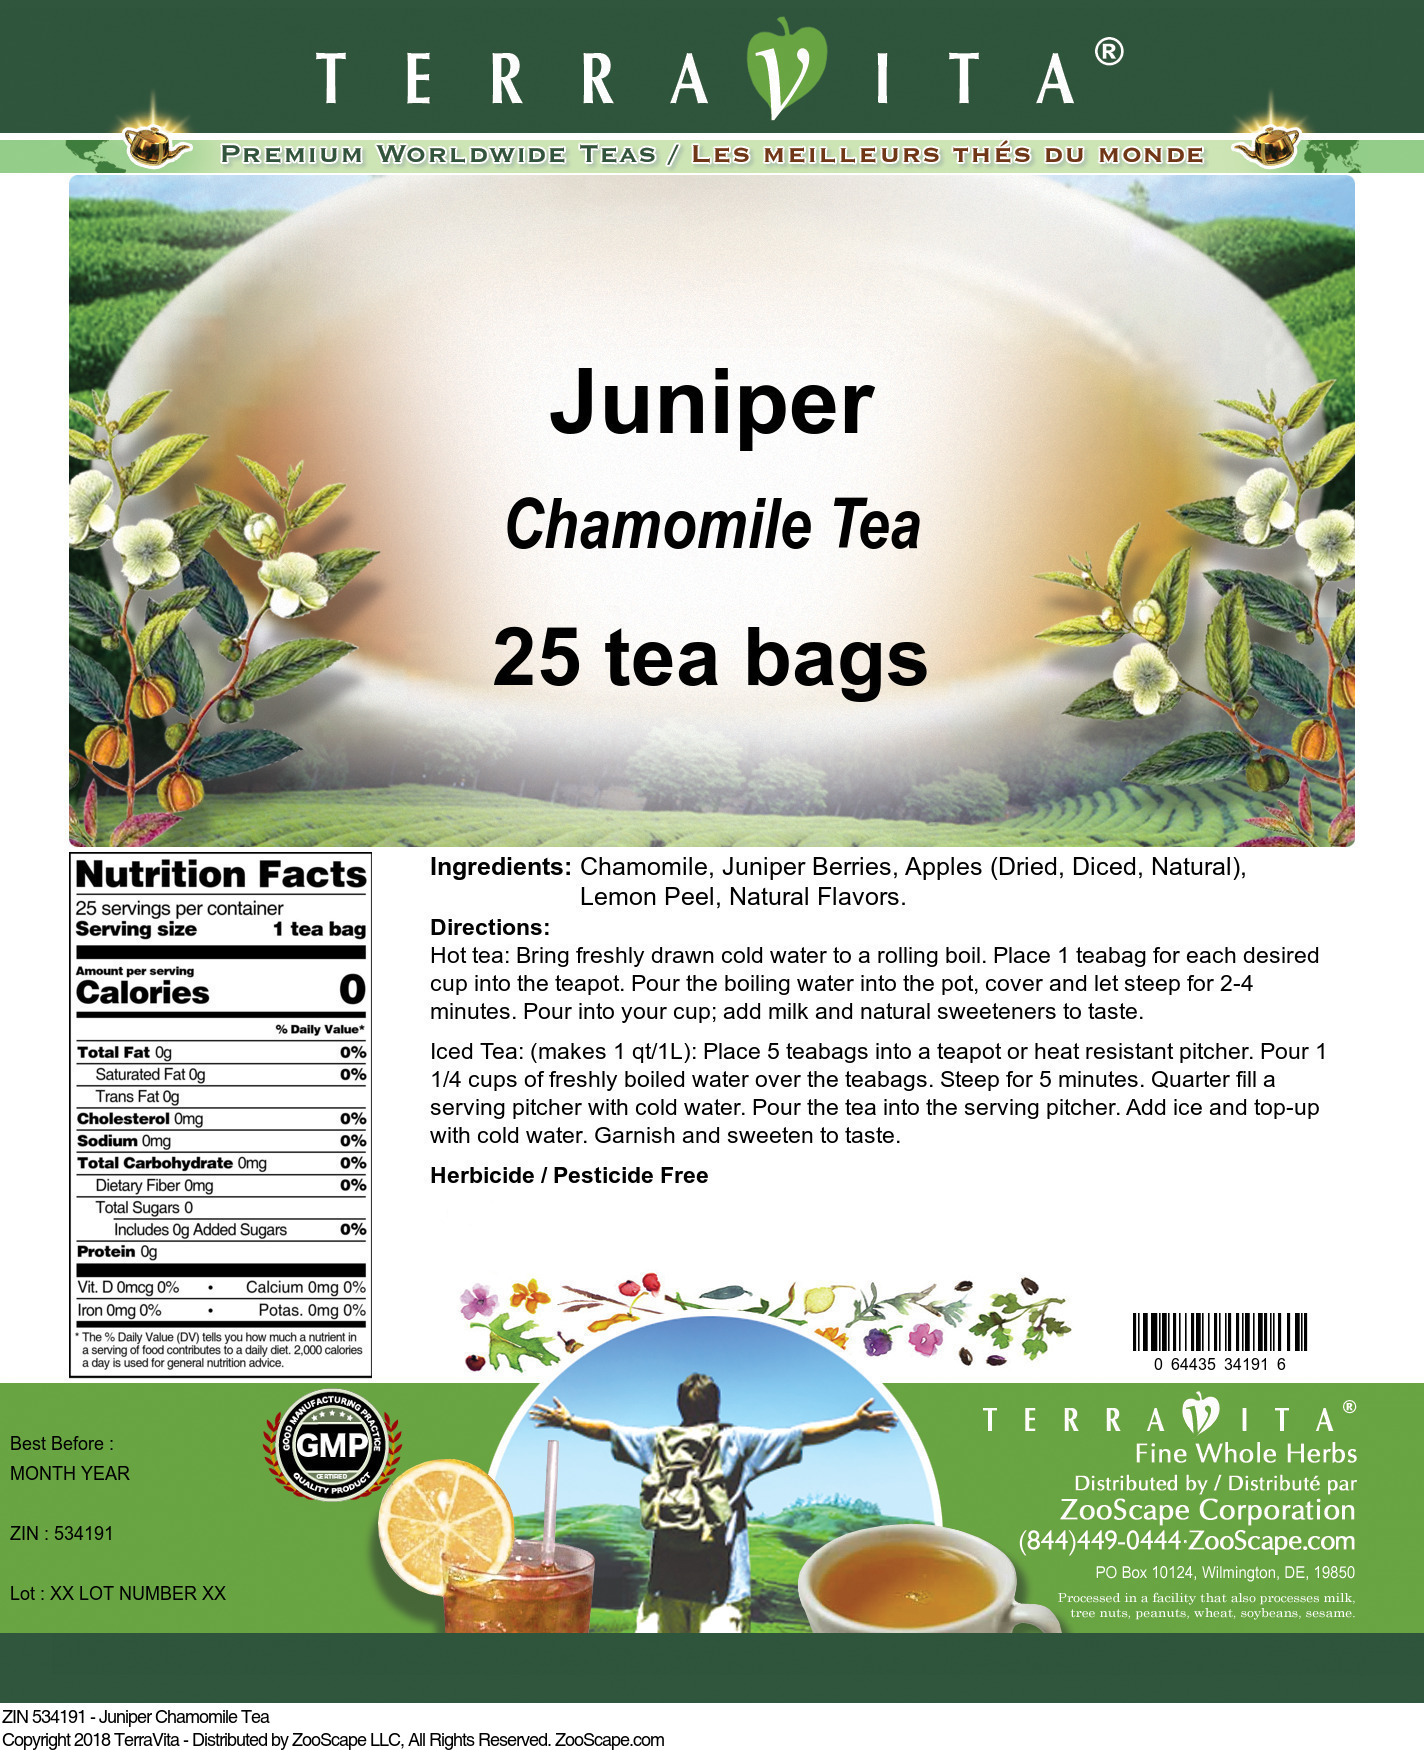 Juniper Chamomile Tea